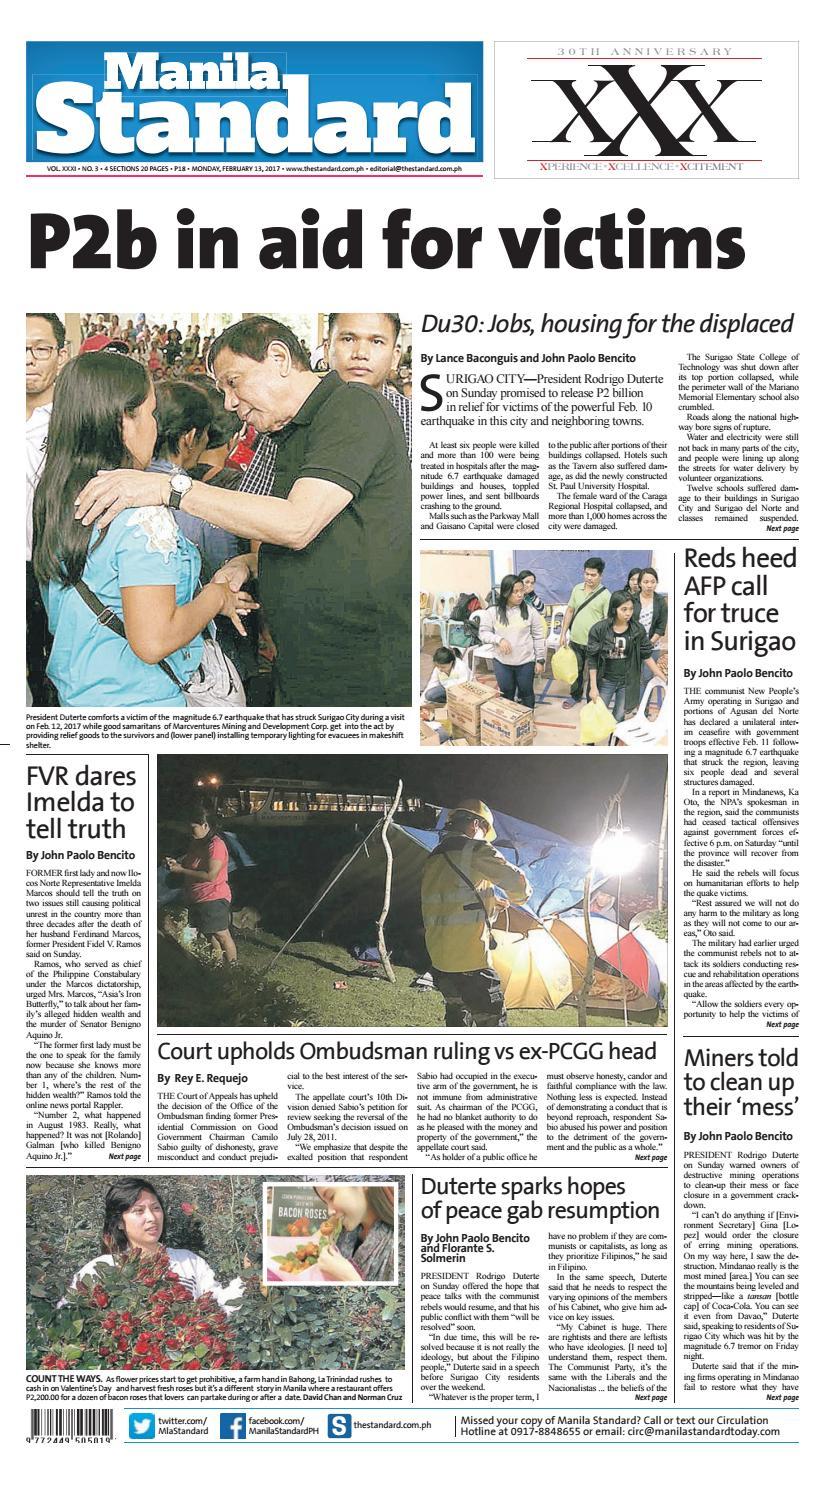 Manila Standard - 2017 February 13 - Monday by Manila